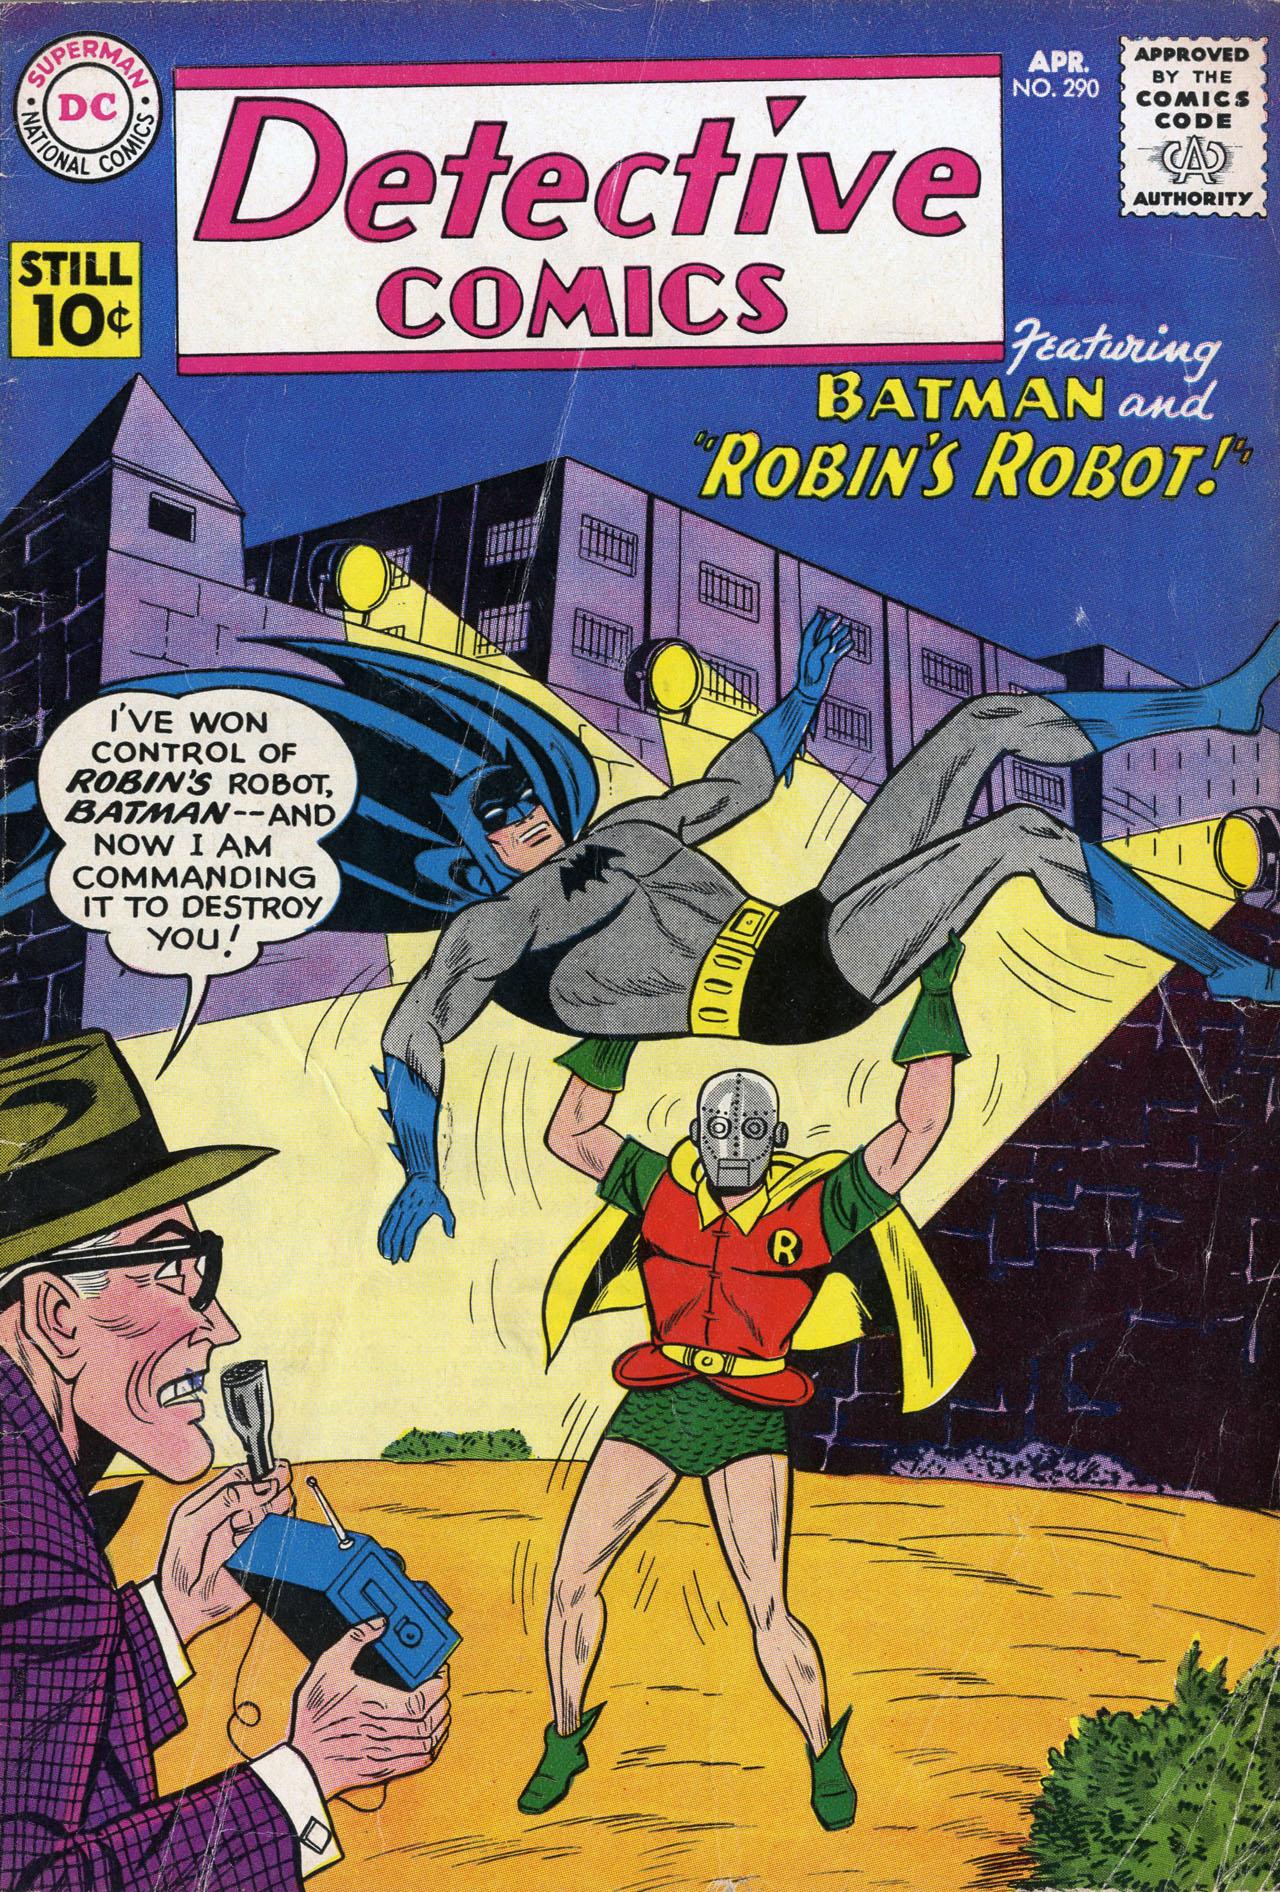 Detective Comics (1937) 290 Page 1